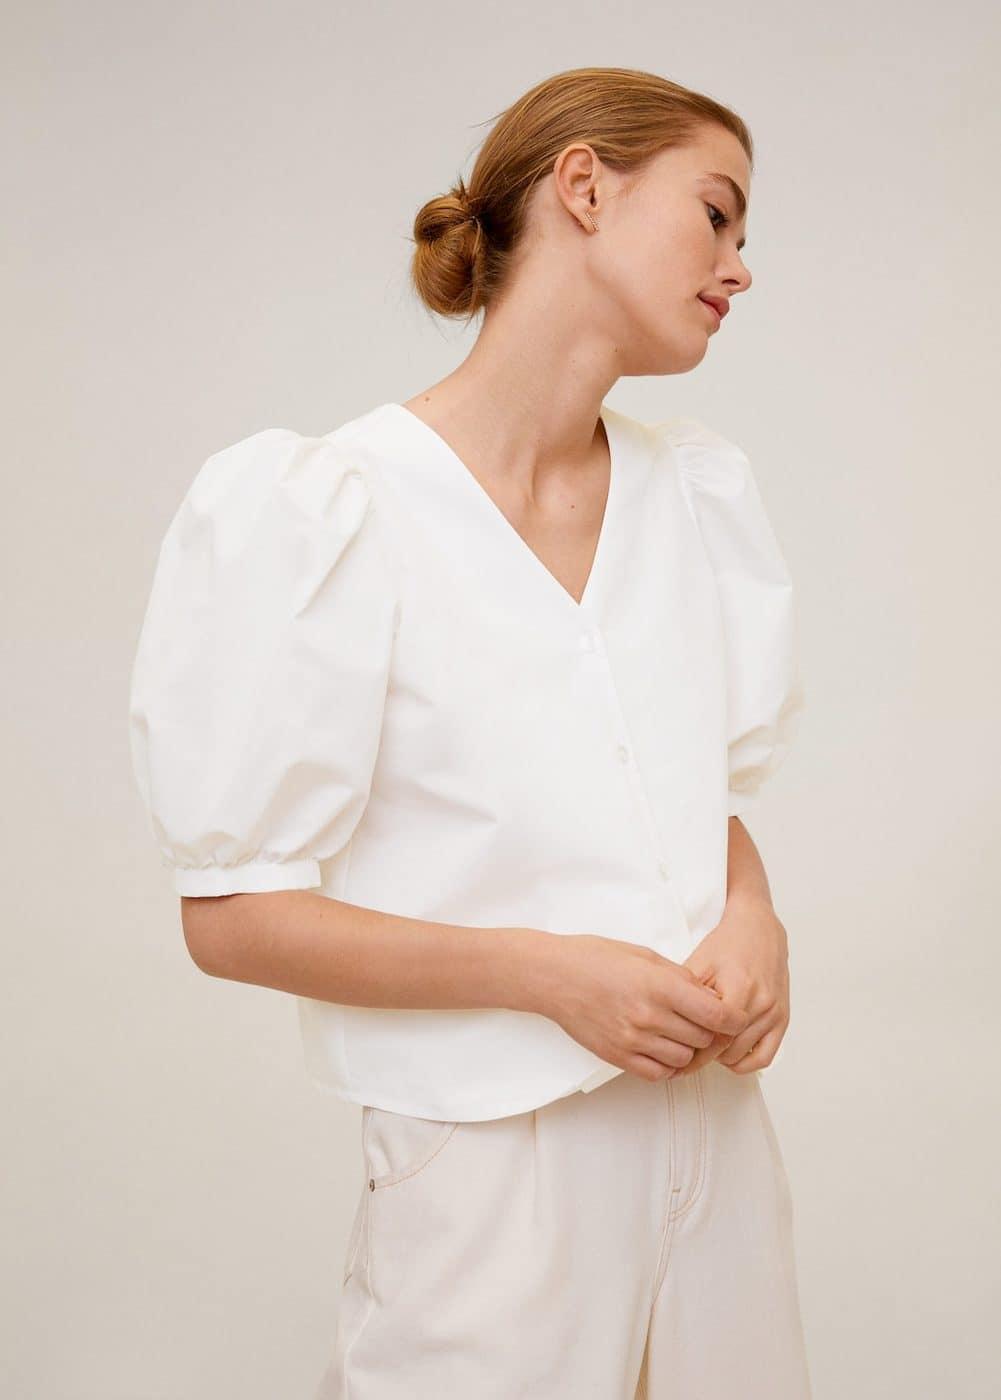 m-cretona6:blusa manga abullonada